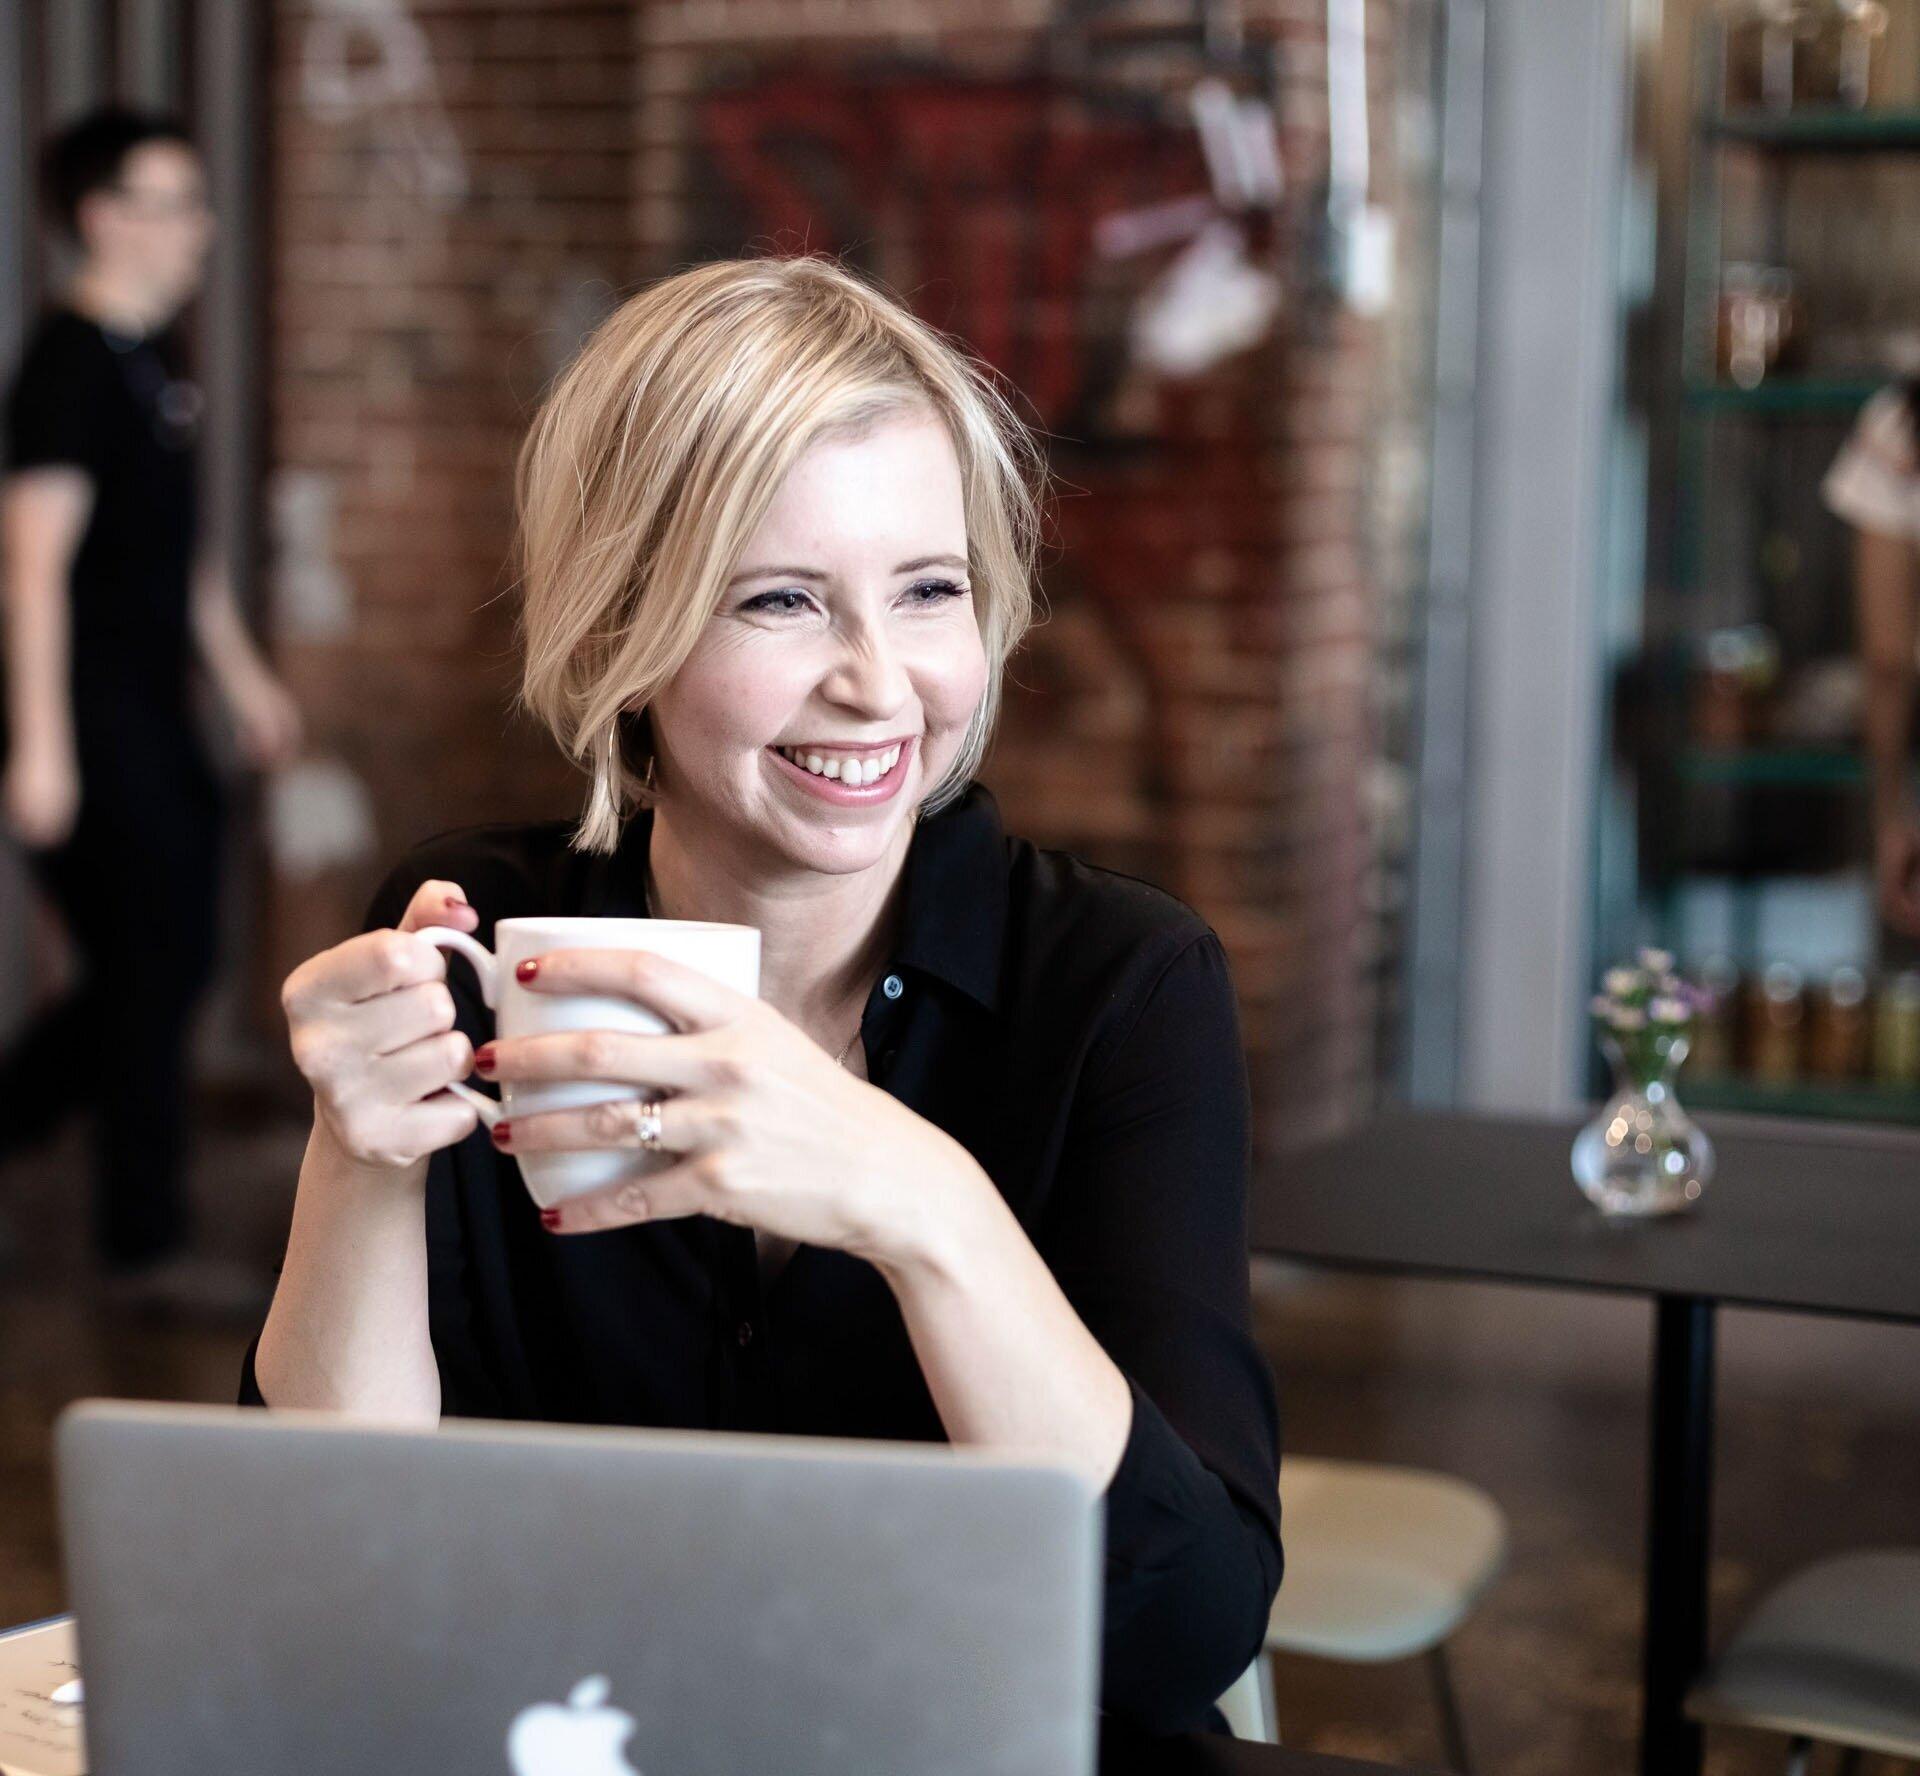 Kristiina+Craven+Pinterest+Strategy+and+Funnels